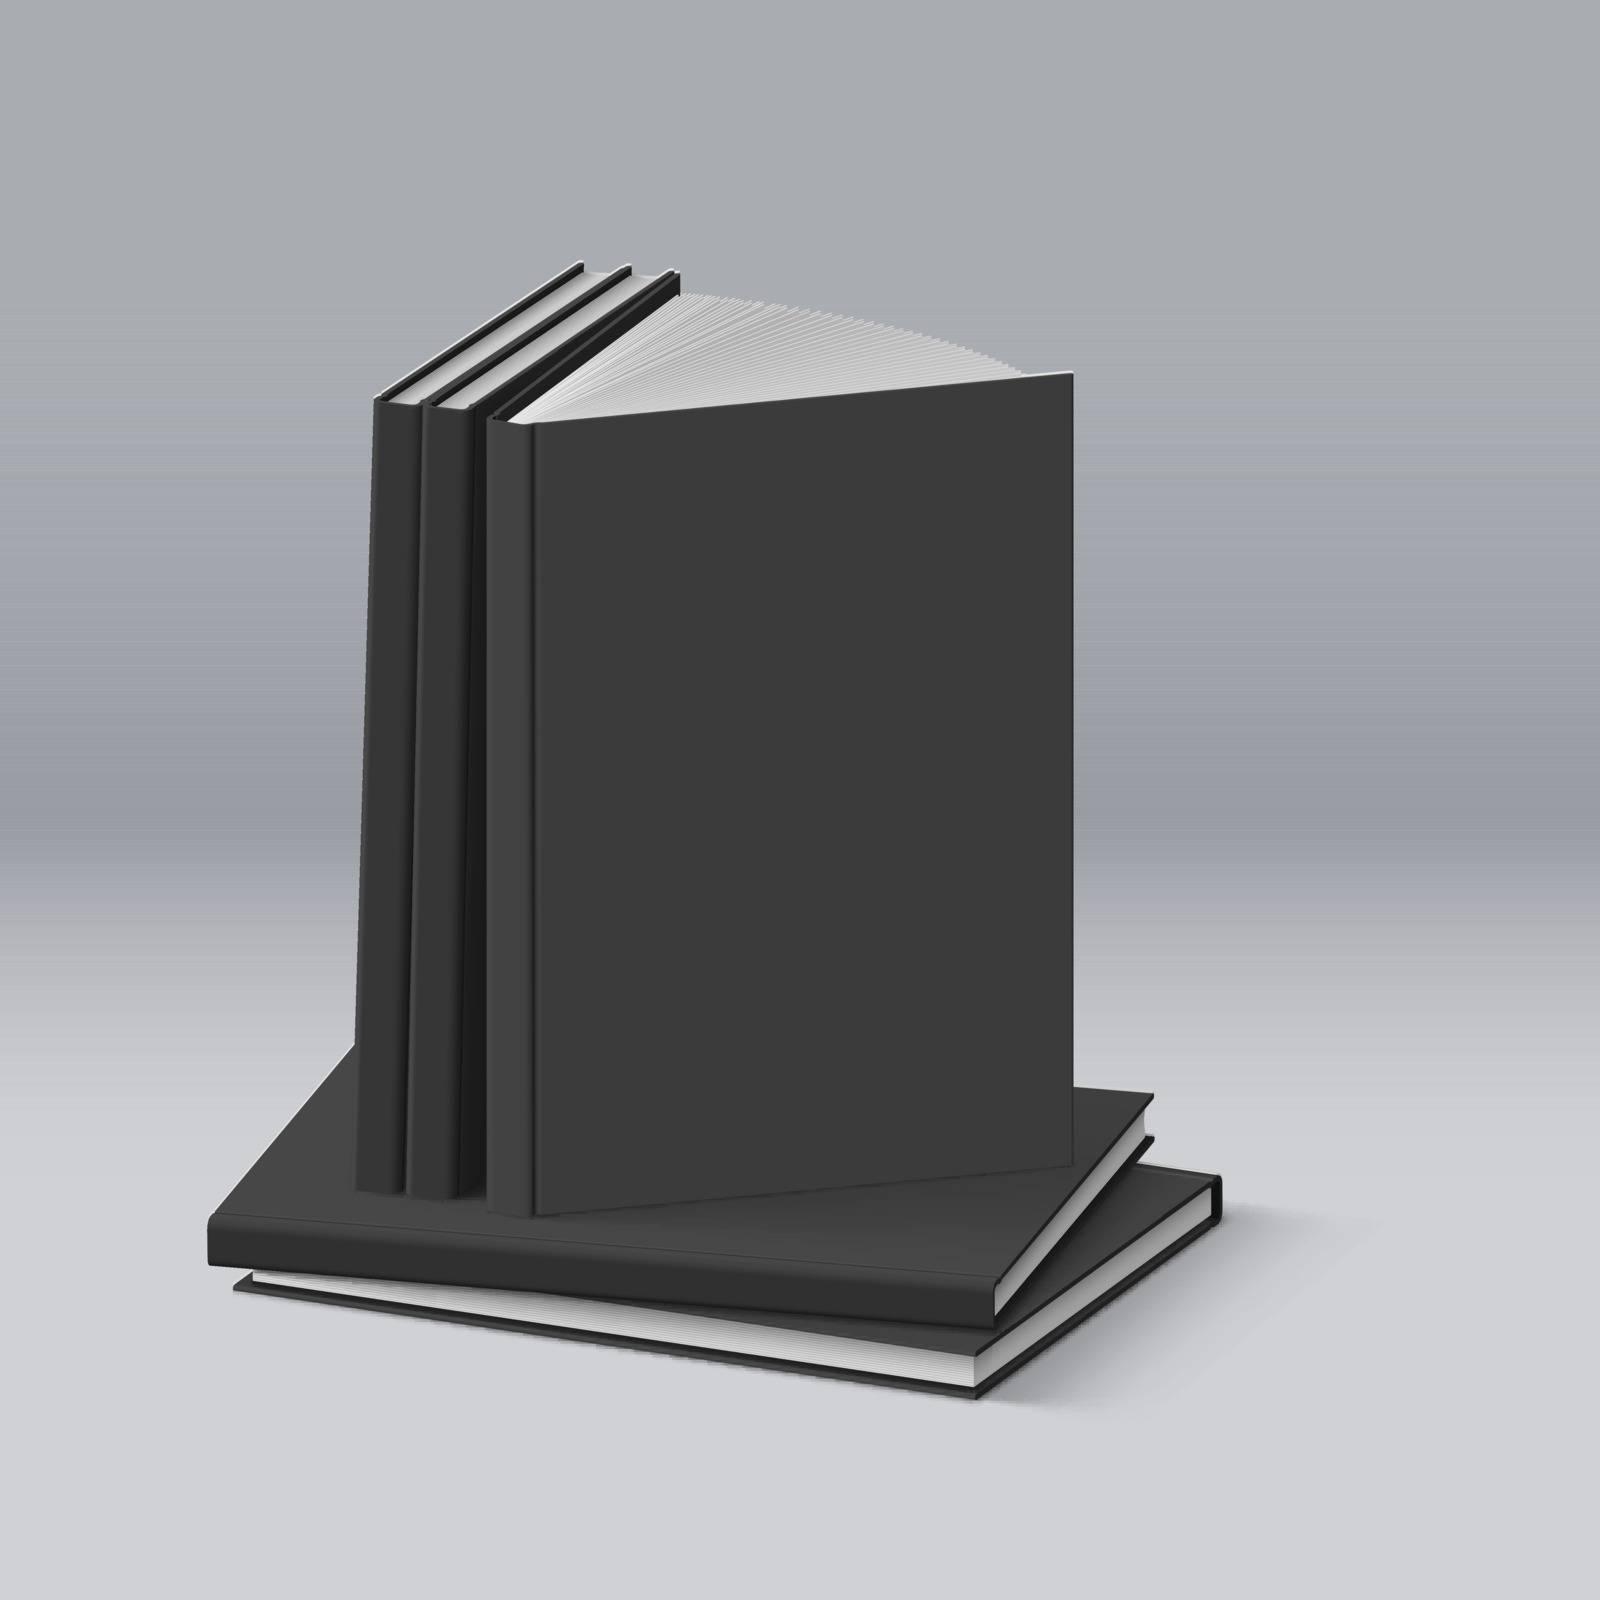 Stack of Blank Black Books. Illustration for Design